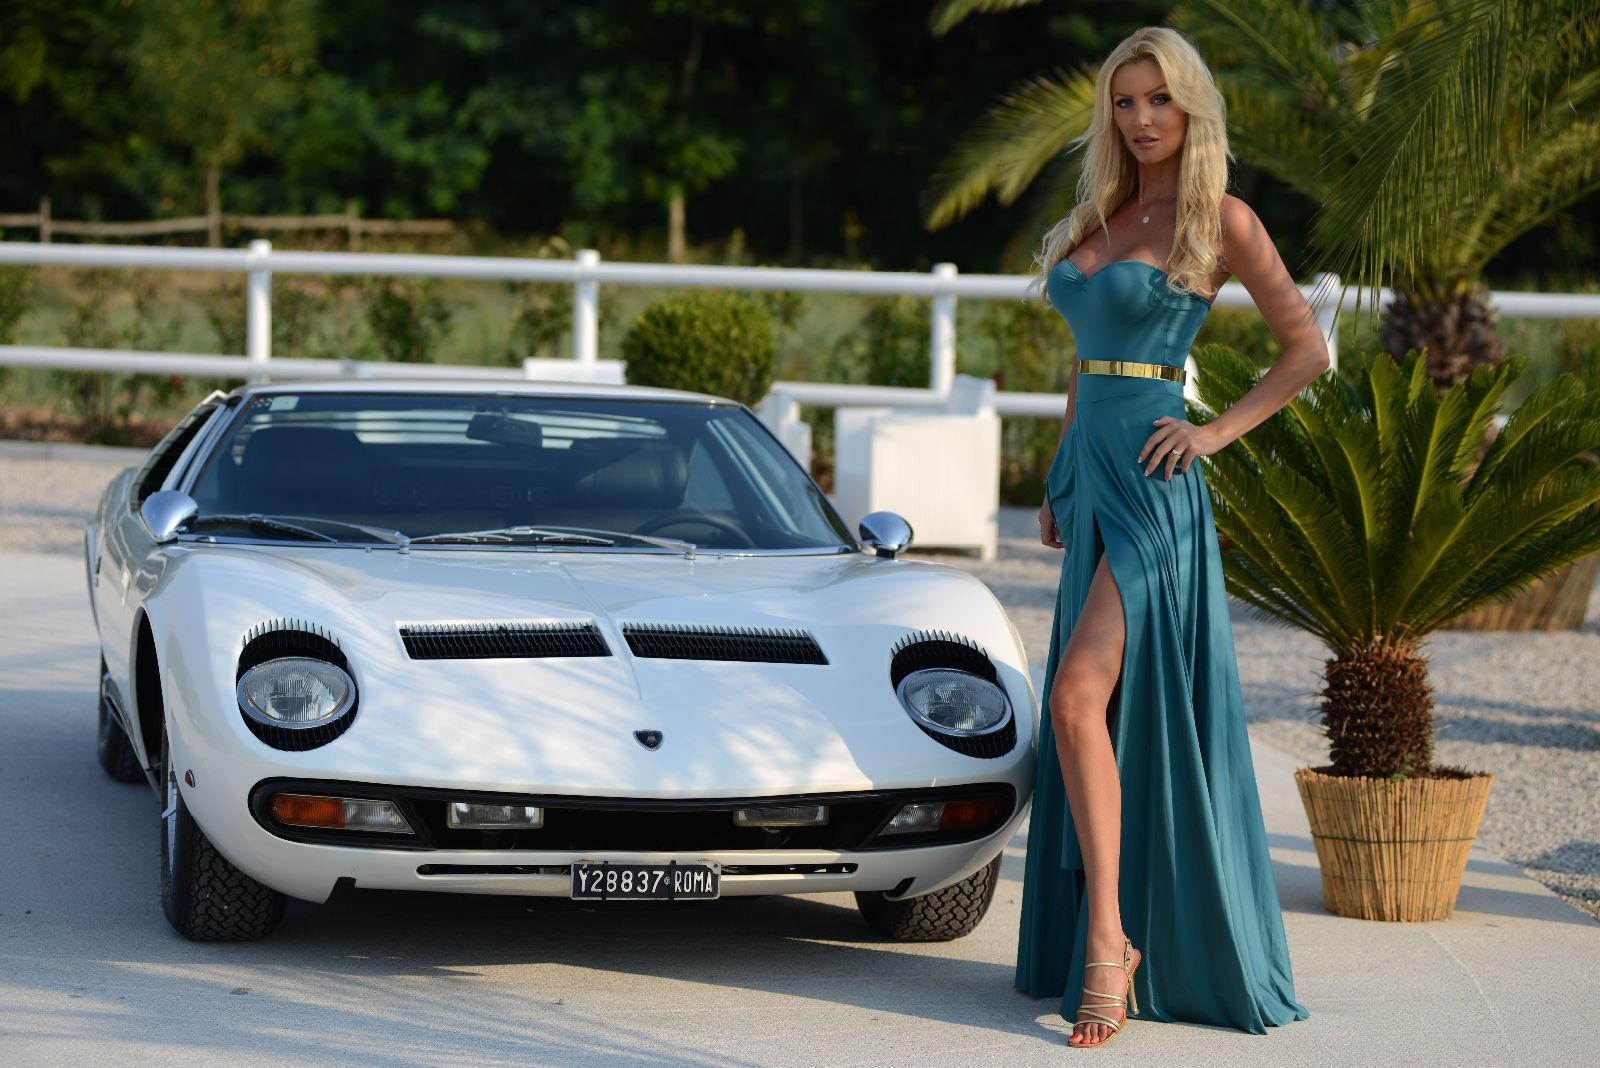 Lamborghini Miura P400s For Sale For 3 Million Euros